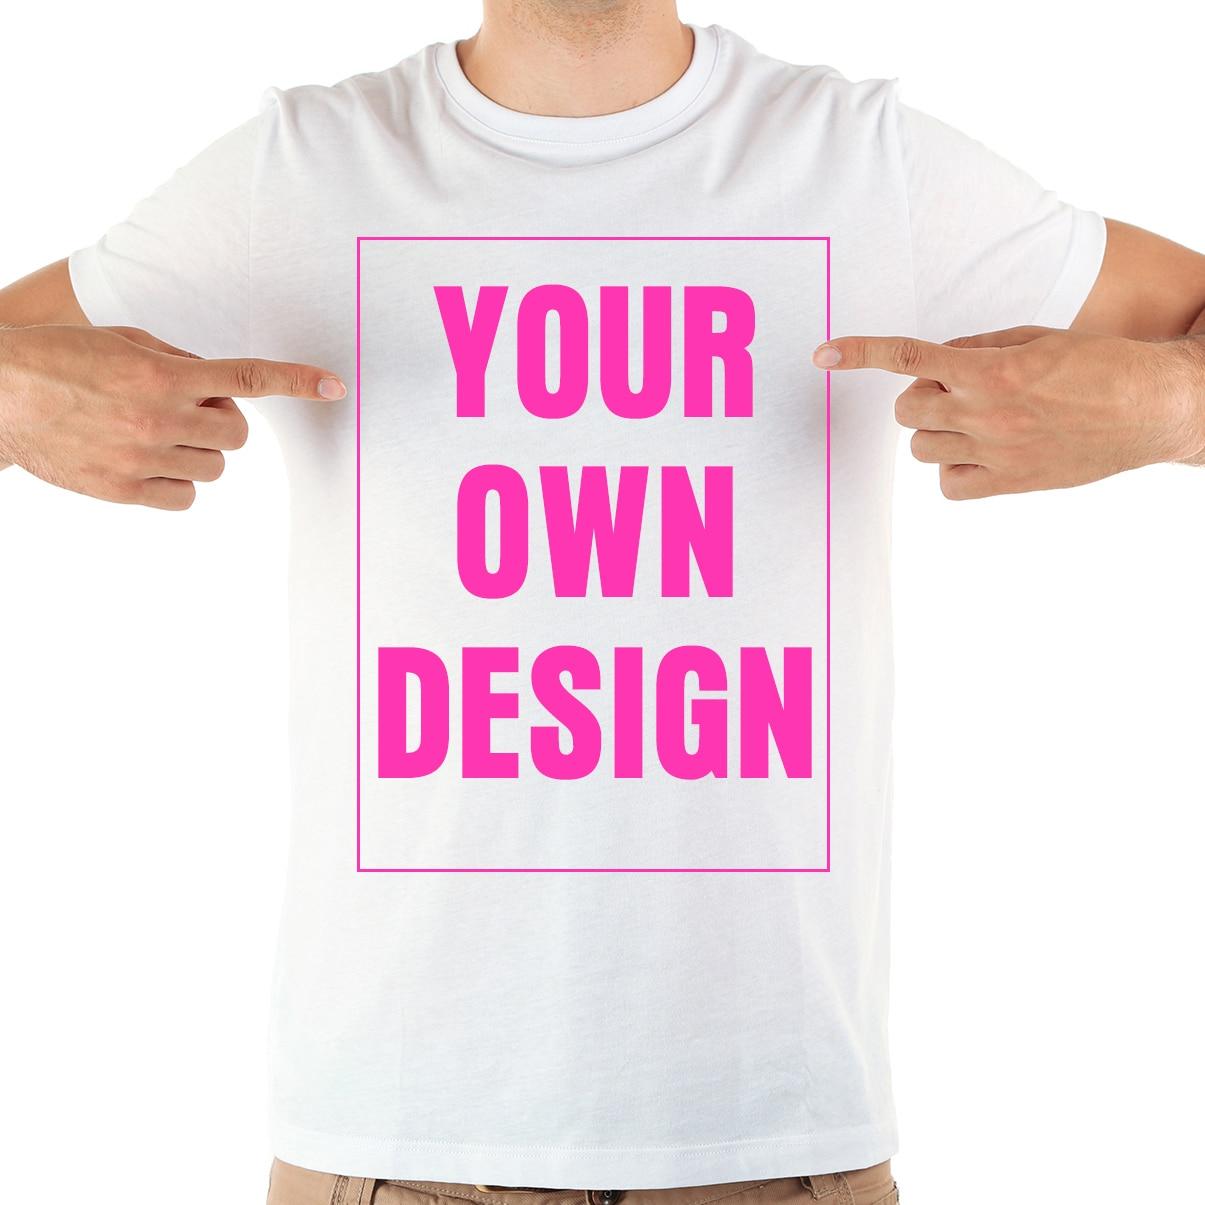 Personalizar diseño de impresión unisex Camiseta Hombre Blanco pantalón corto casual manga personalizada código QR camiseta hombres